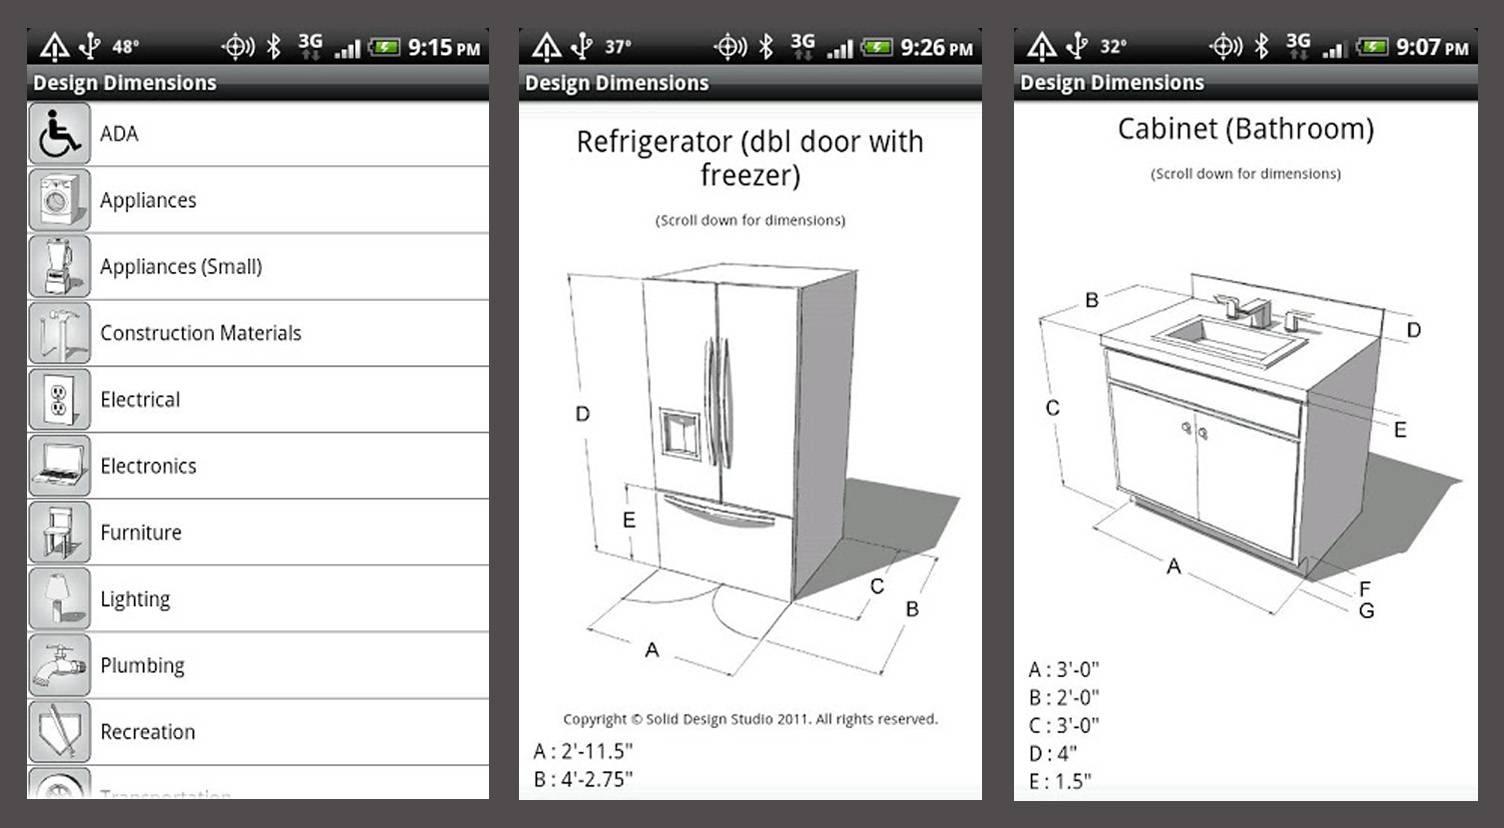 Design Dimensions Img1 Diamond Interiors Kitchens Bathrooms